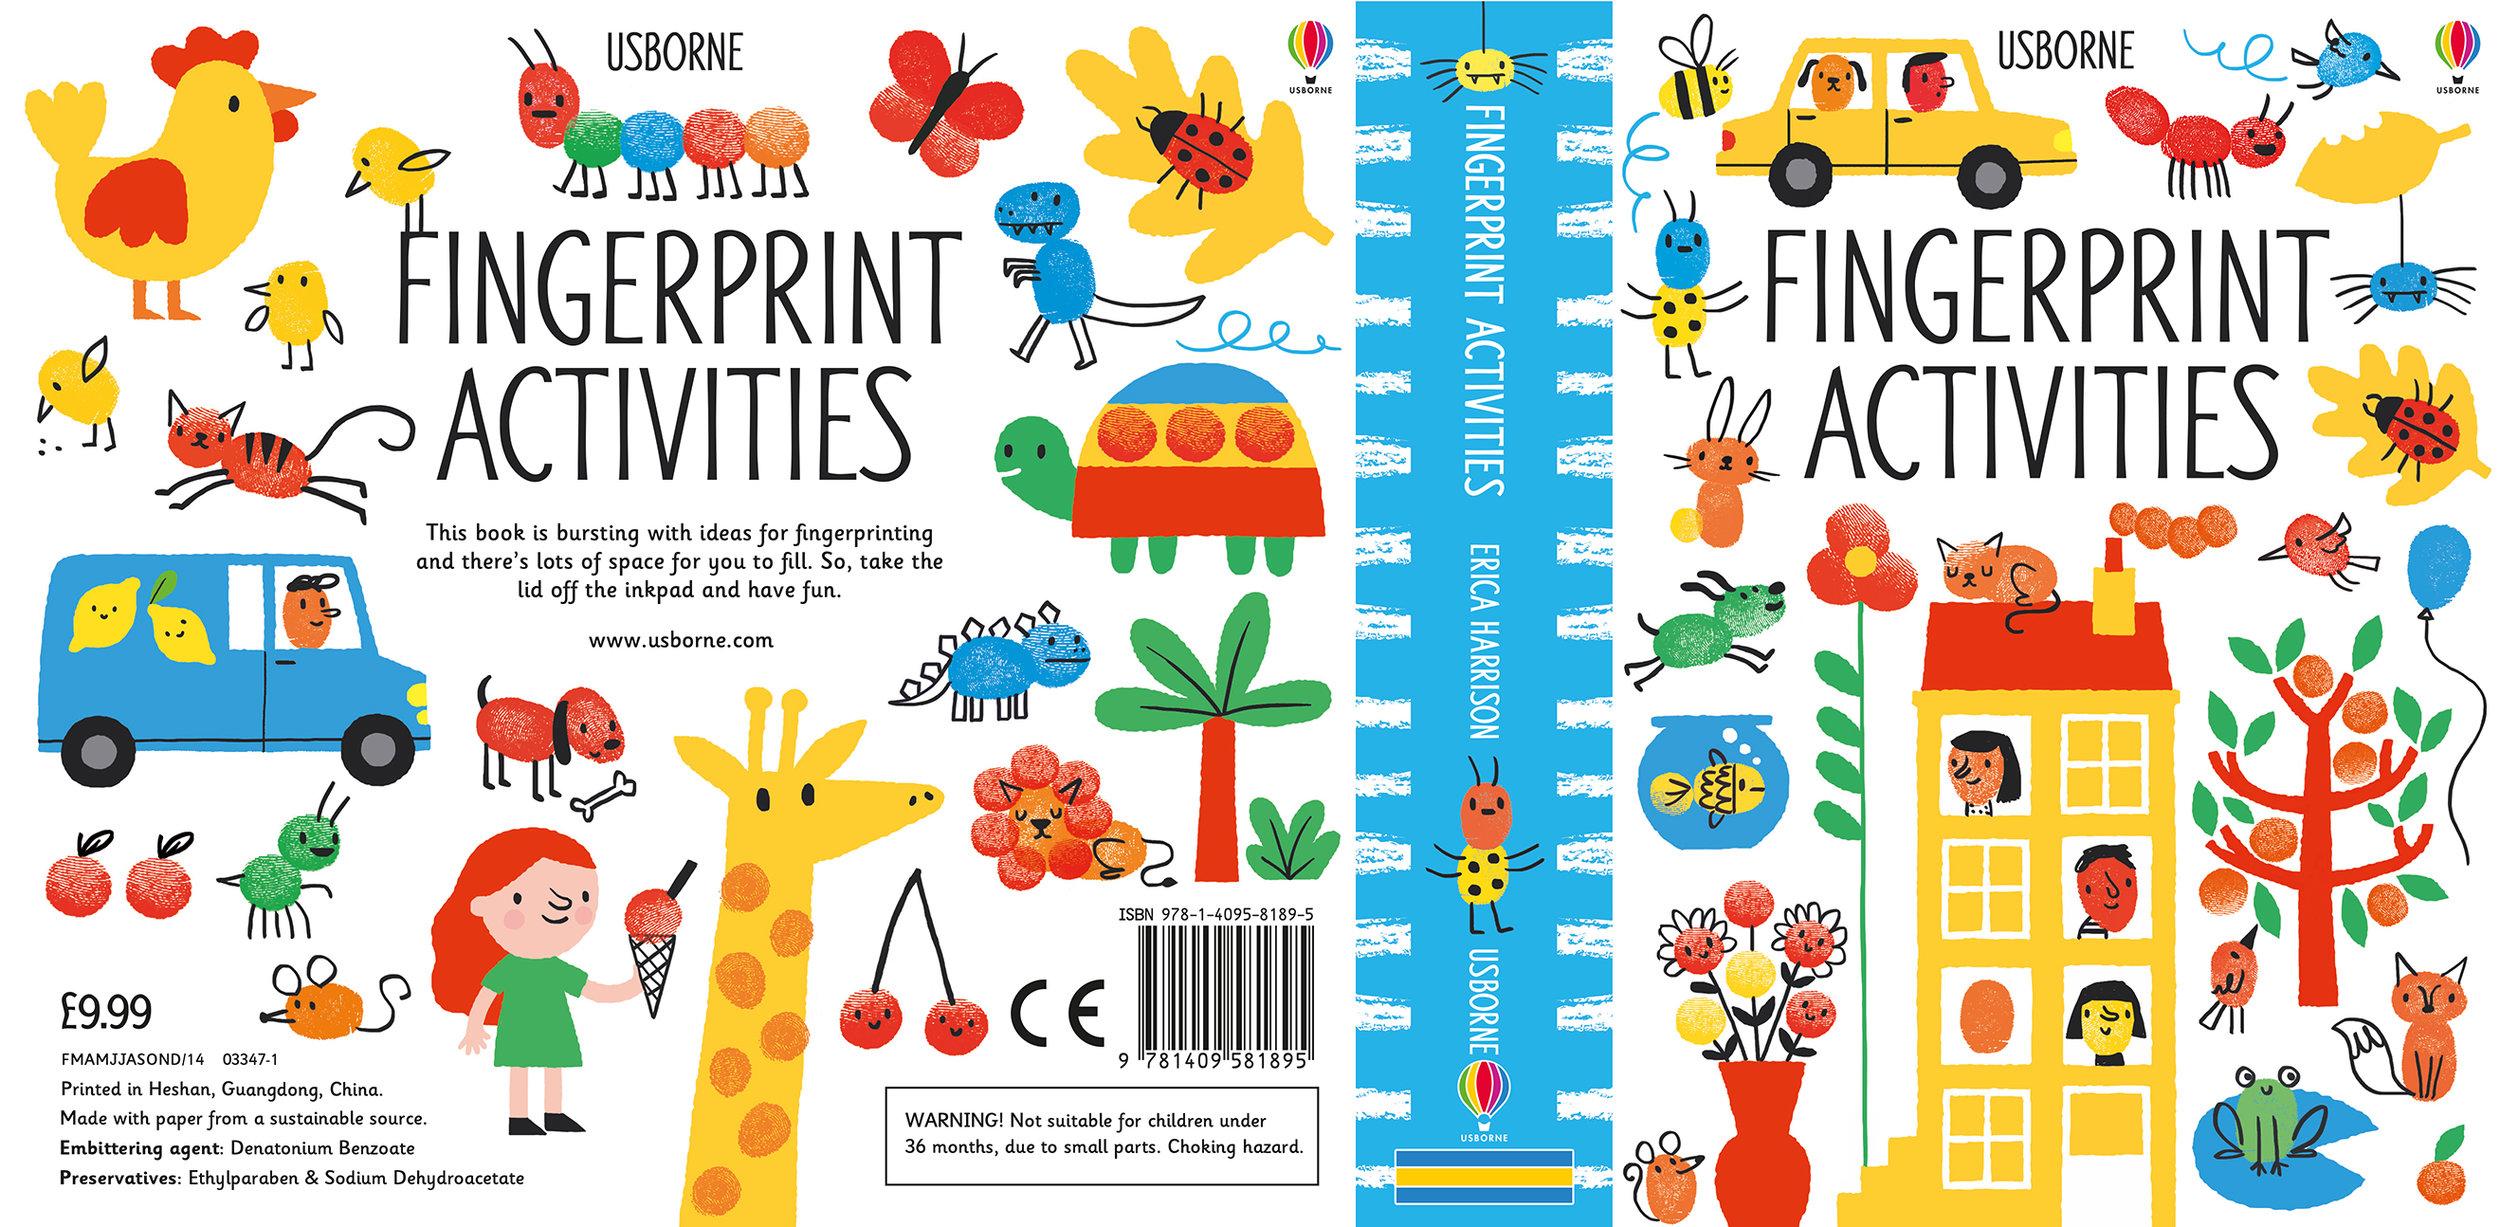 Fingerprint Activities Cover.jpg